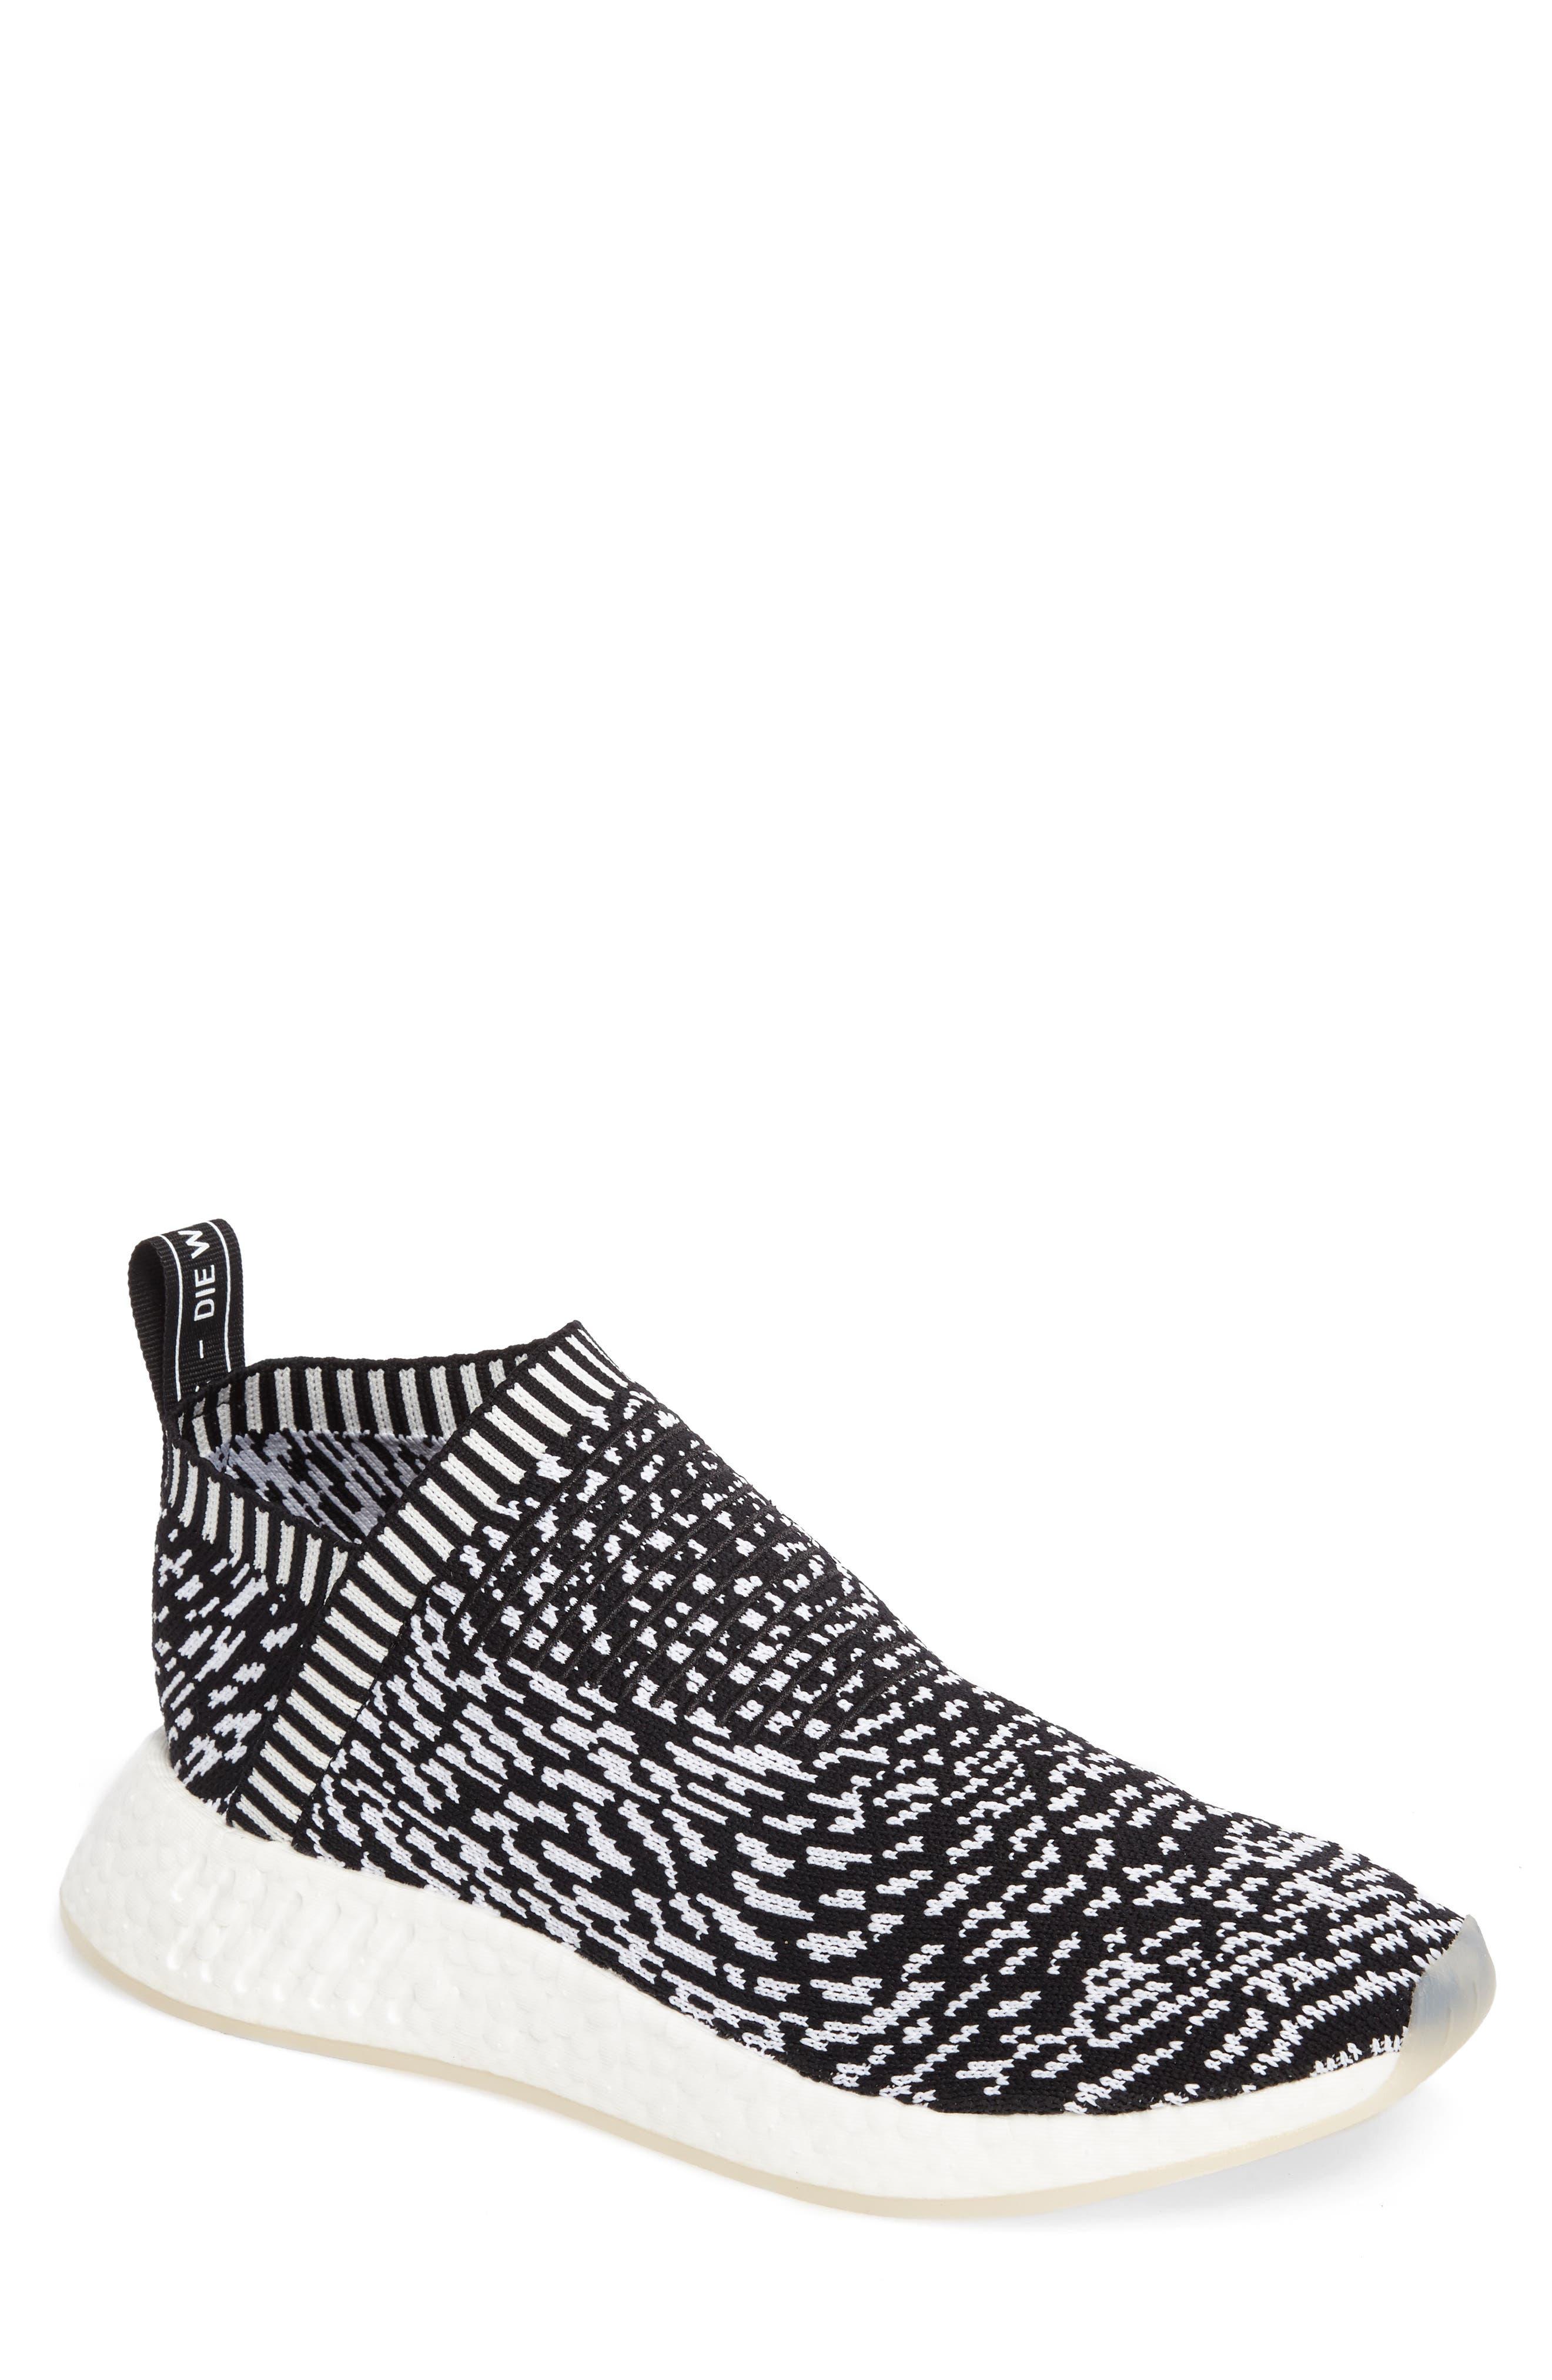 adidas NMD_CS2 Primeknit Sneaker (Men)